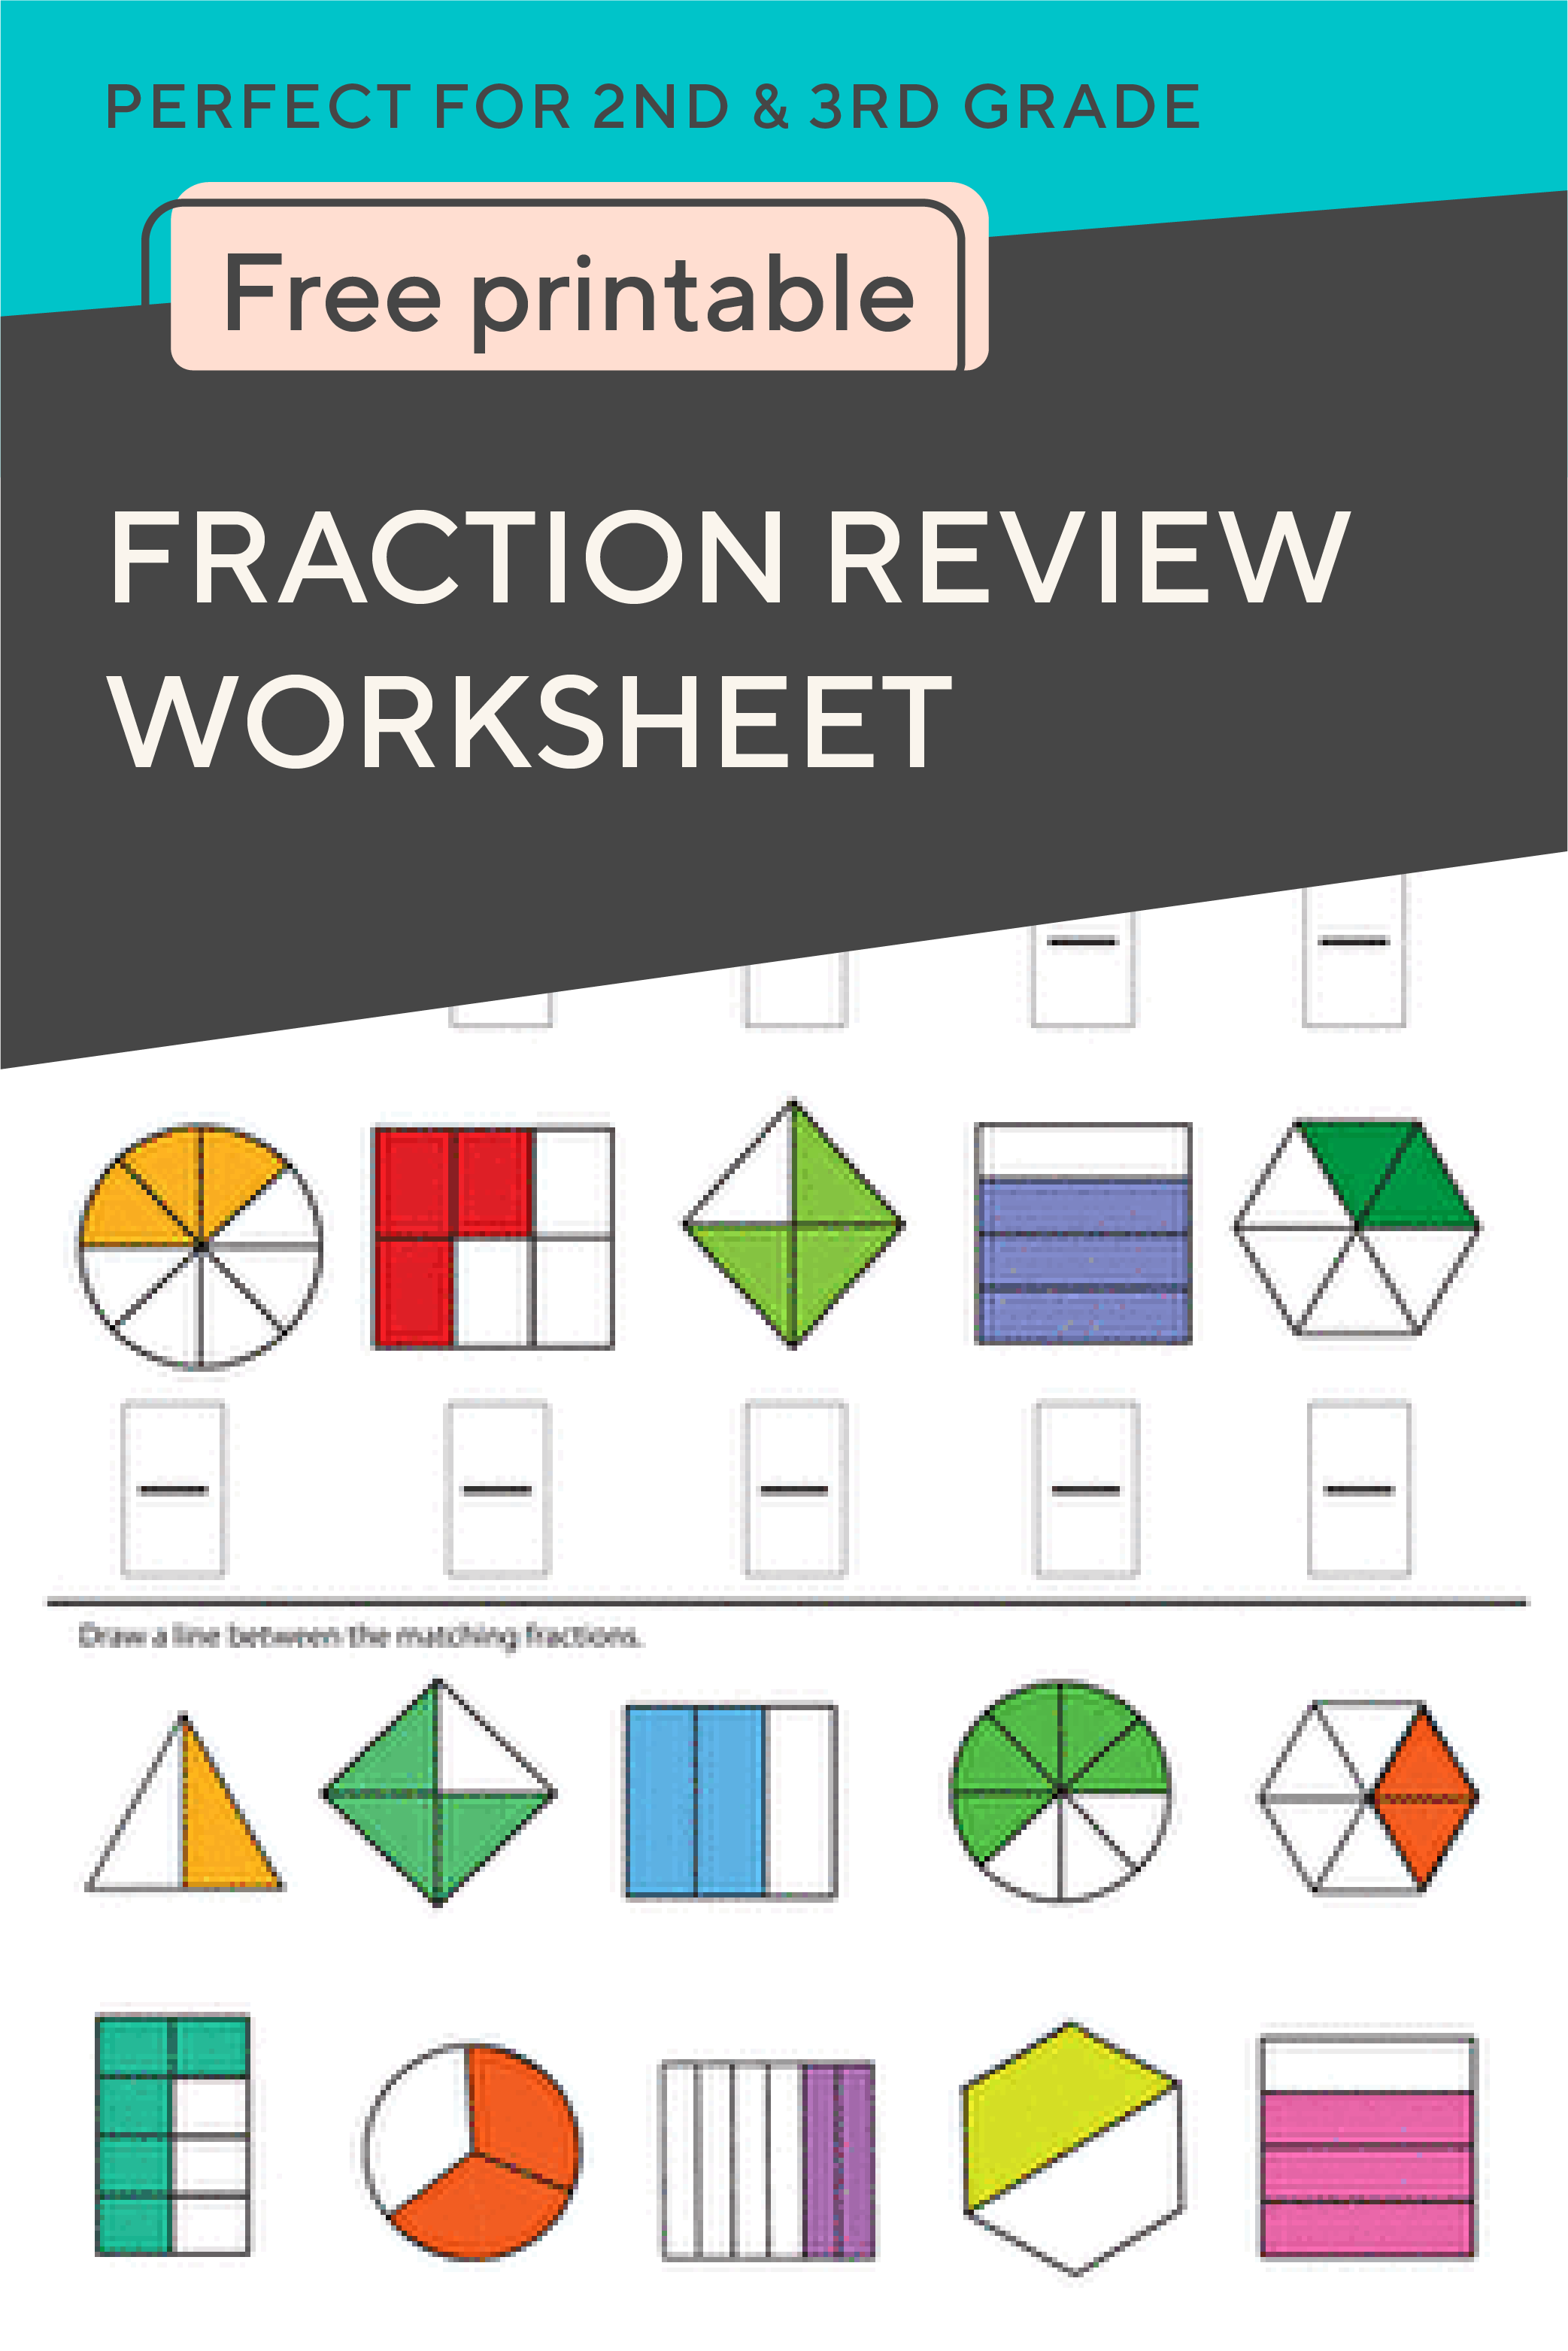 Fraction Review Worksheet